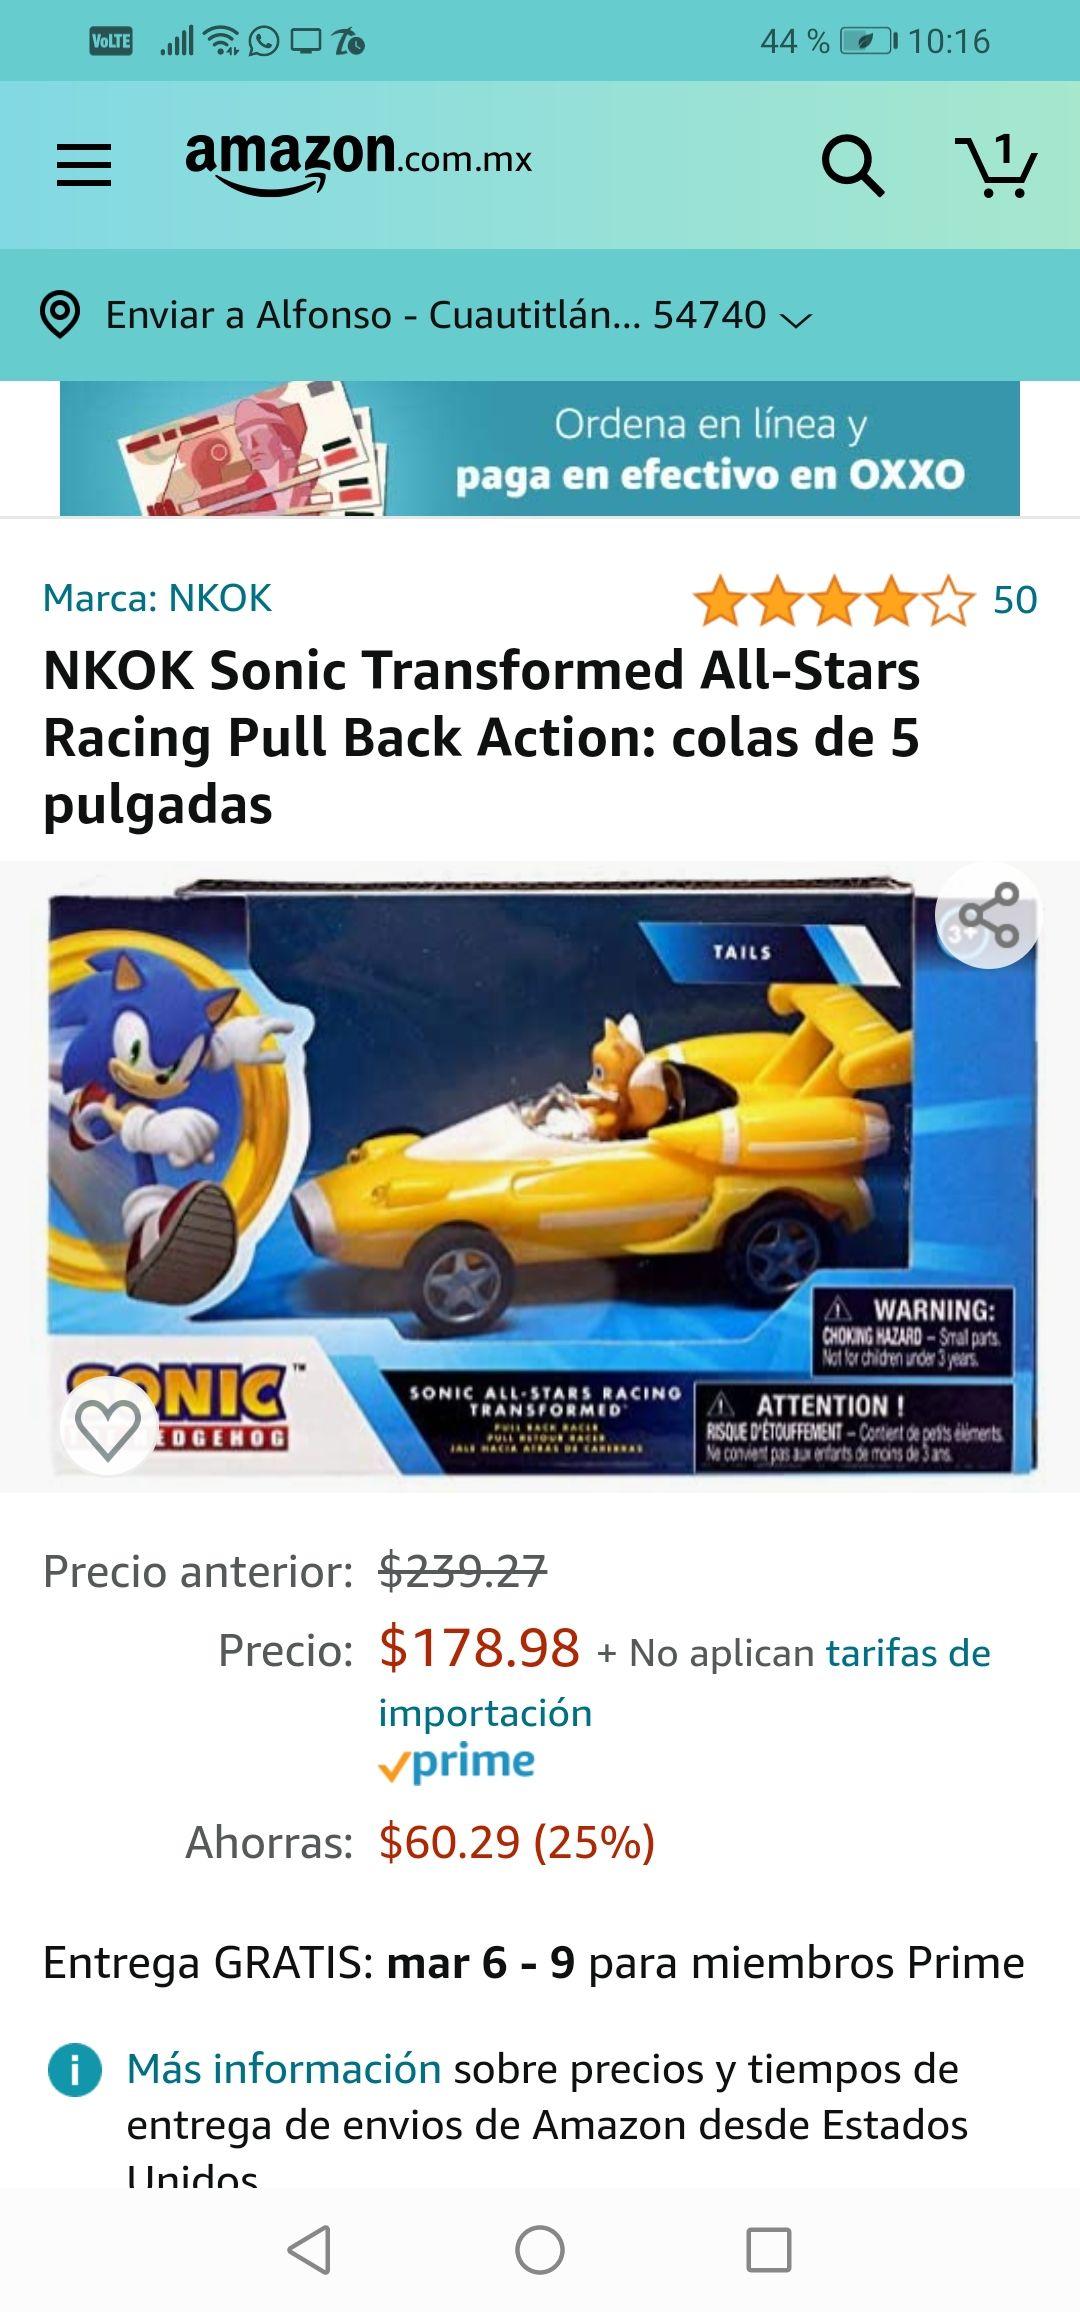 Amazon :NKOK Sonic Transformed All-Stars Racing Pull Back Action: colas de 5 pulgadas